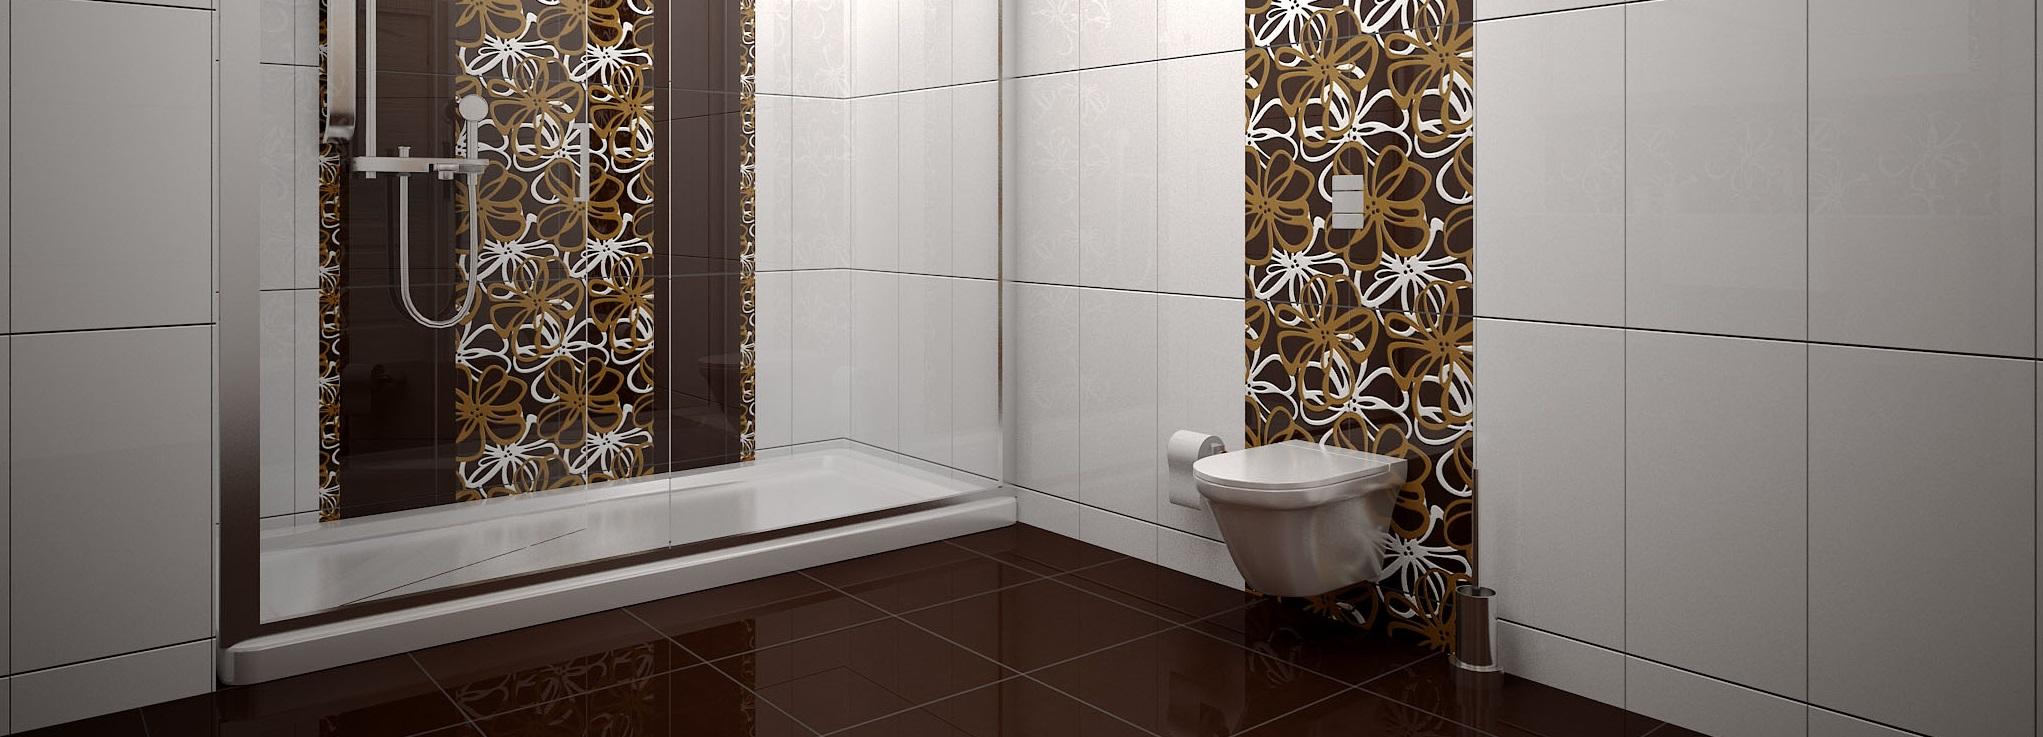 banyo, mutfak, wc, zemin fayans kalebodur tadilat dekorasyon